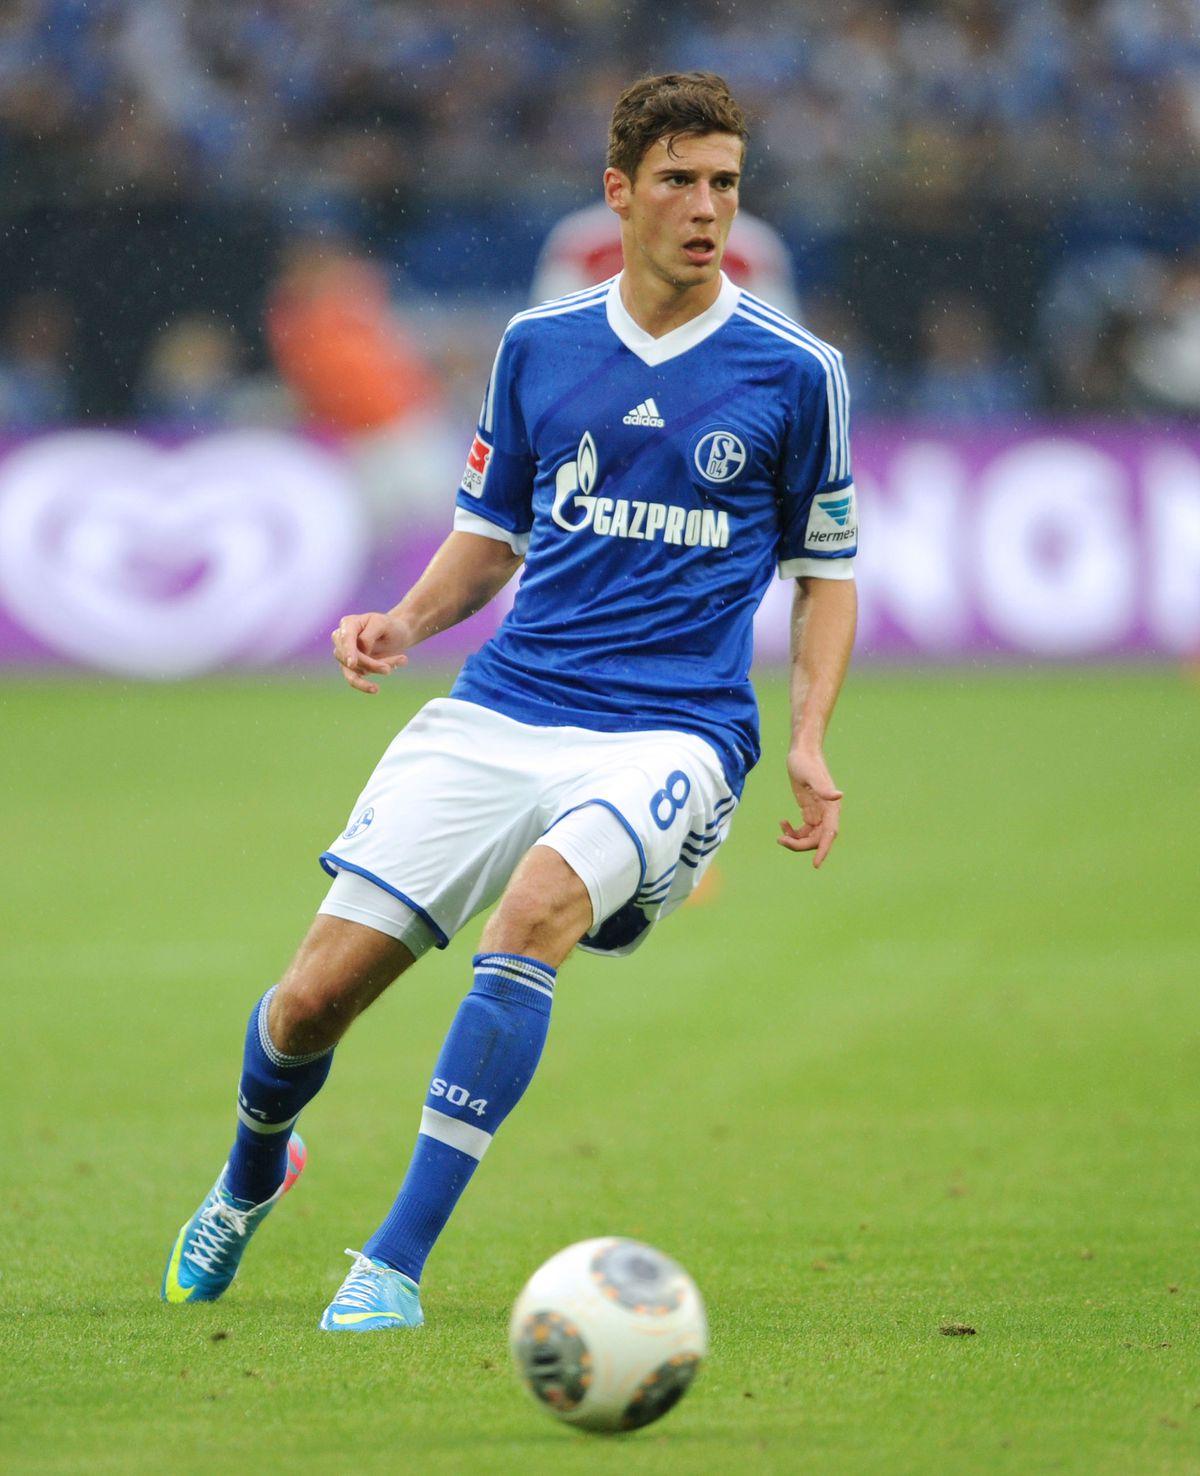 1. Bundesliga, 1. Spieltag, FC Schalke 04 - Hamburger SV